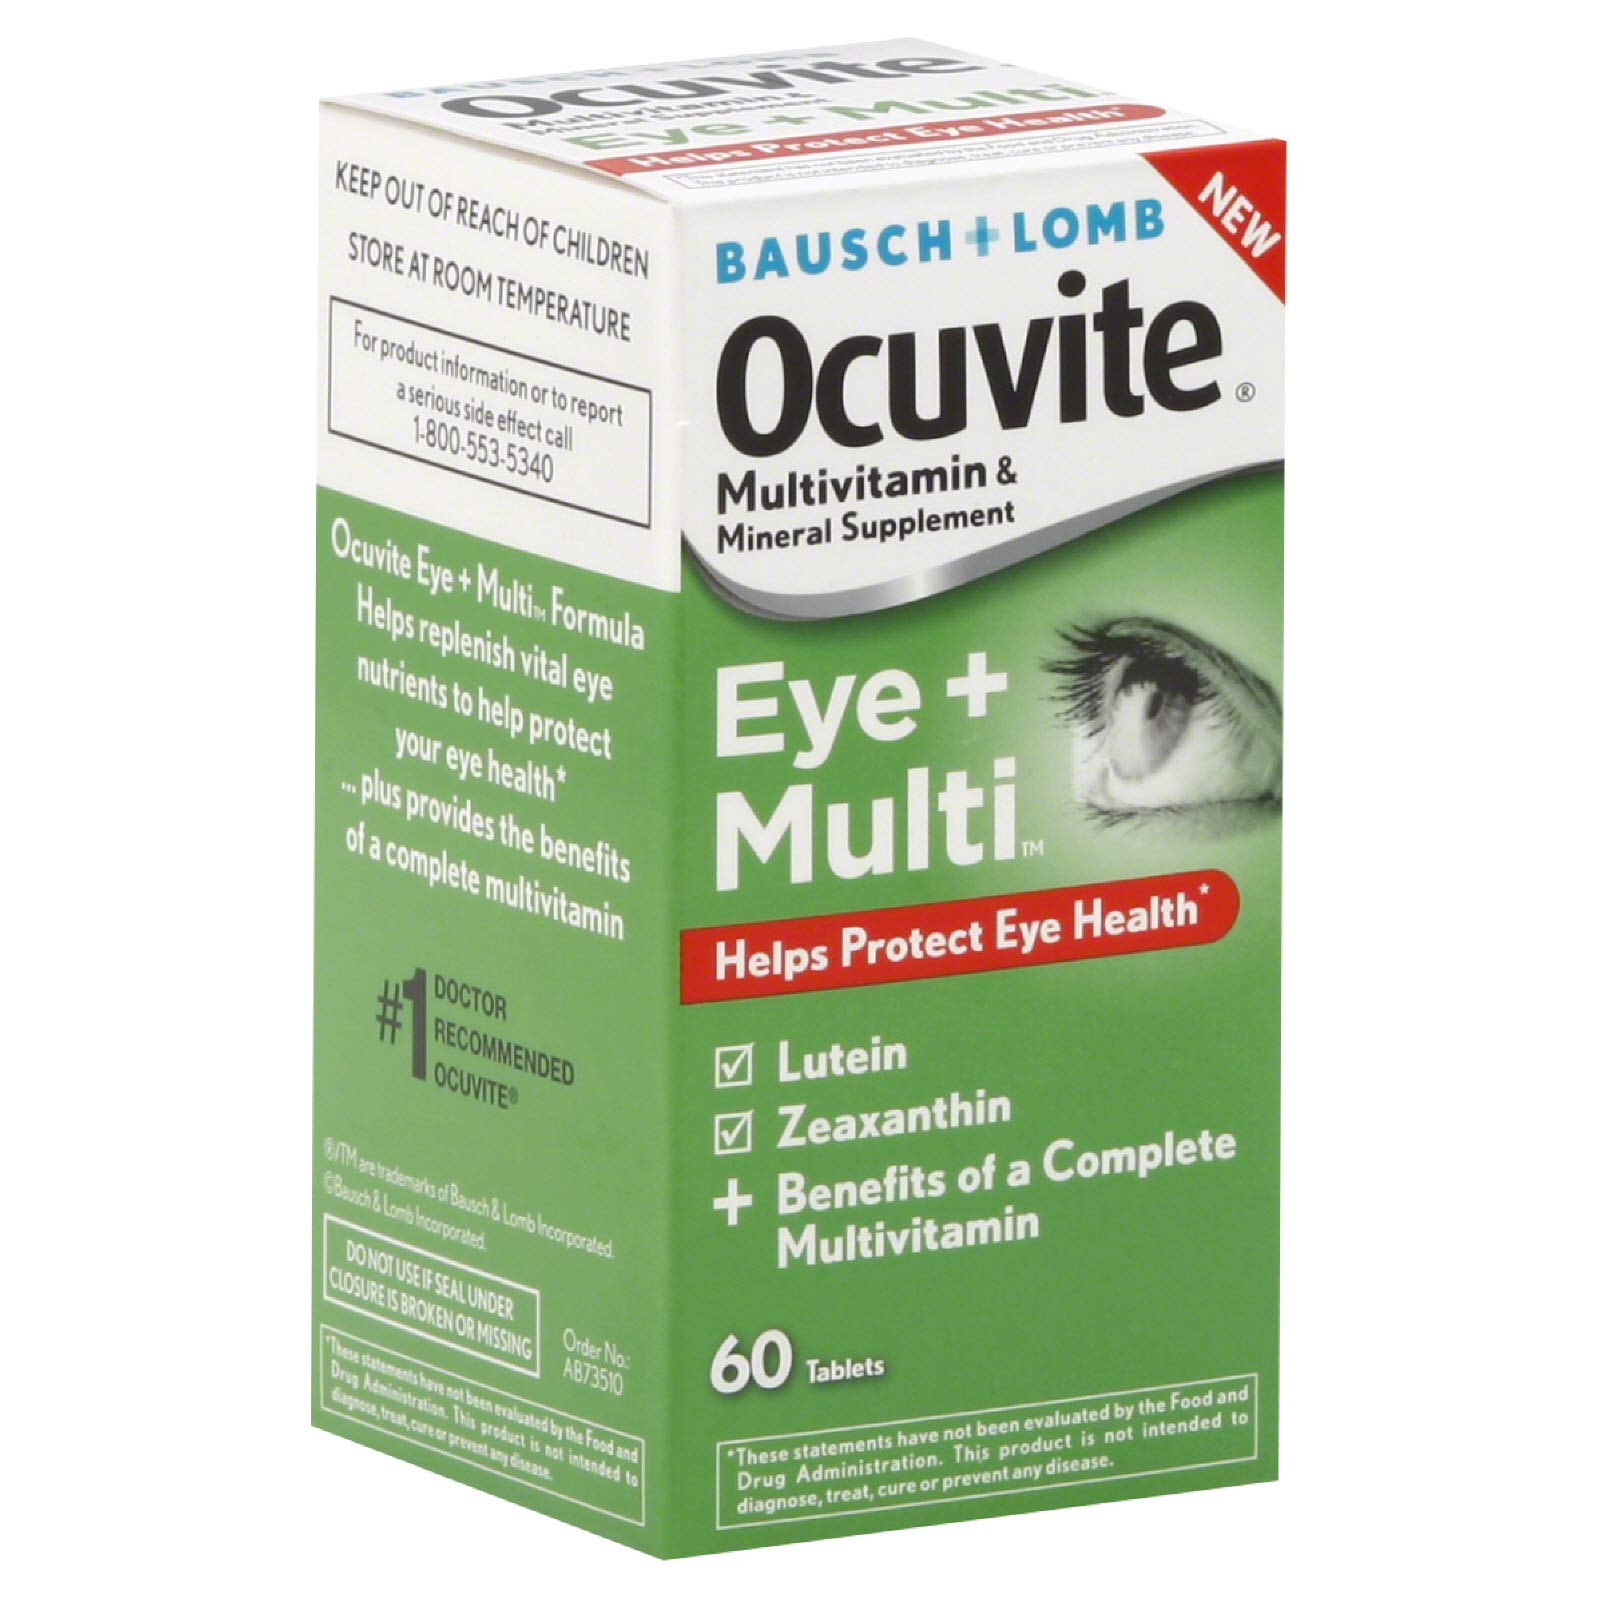 B&L Ocuvite Eye + Multi Size 60ct B&L Ocuvite Eye + Multi 60ct by Bausch & Lomb